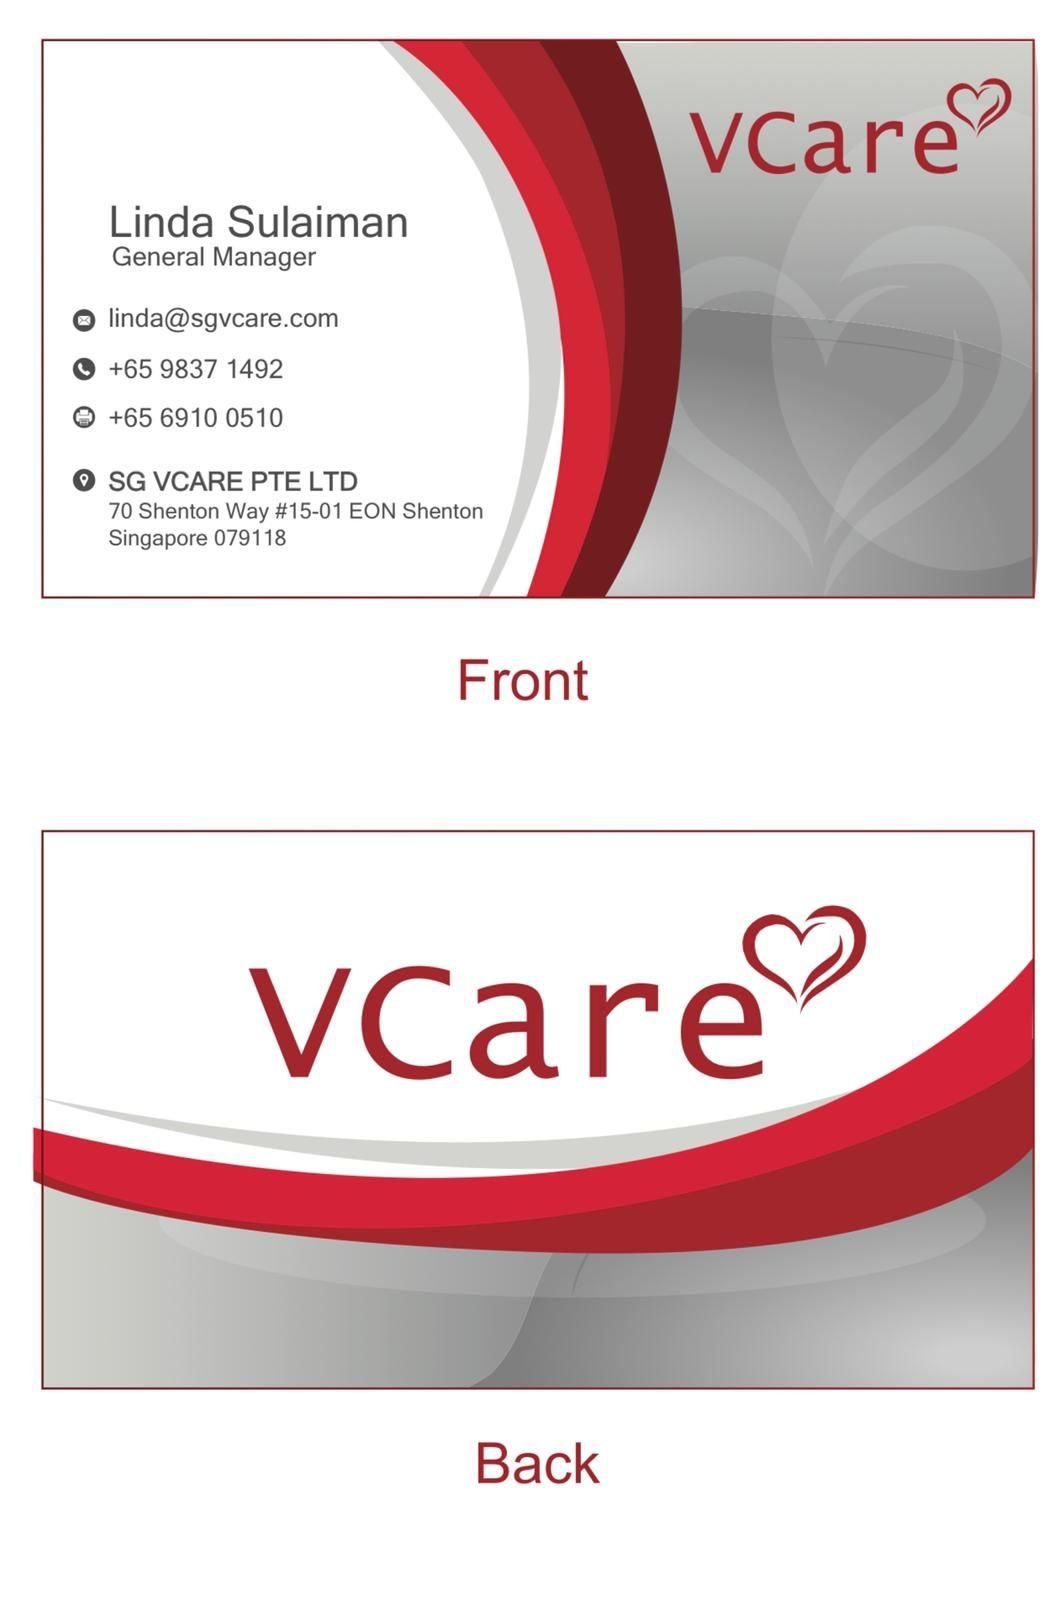 Company - SG VCARE PTE LTD